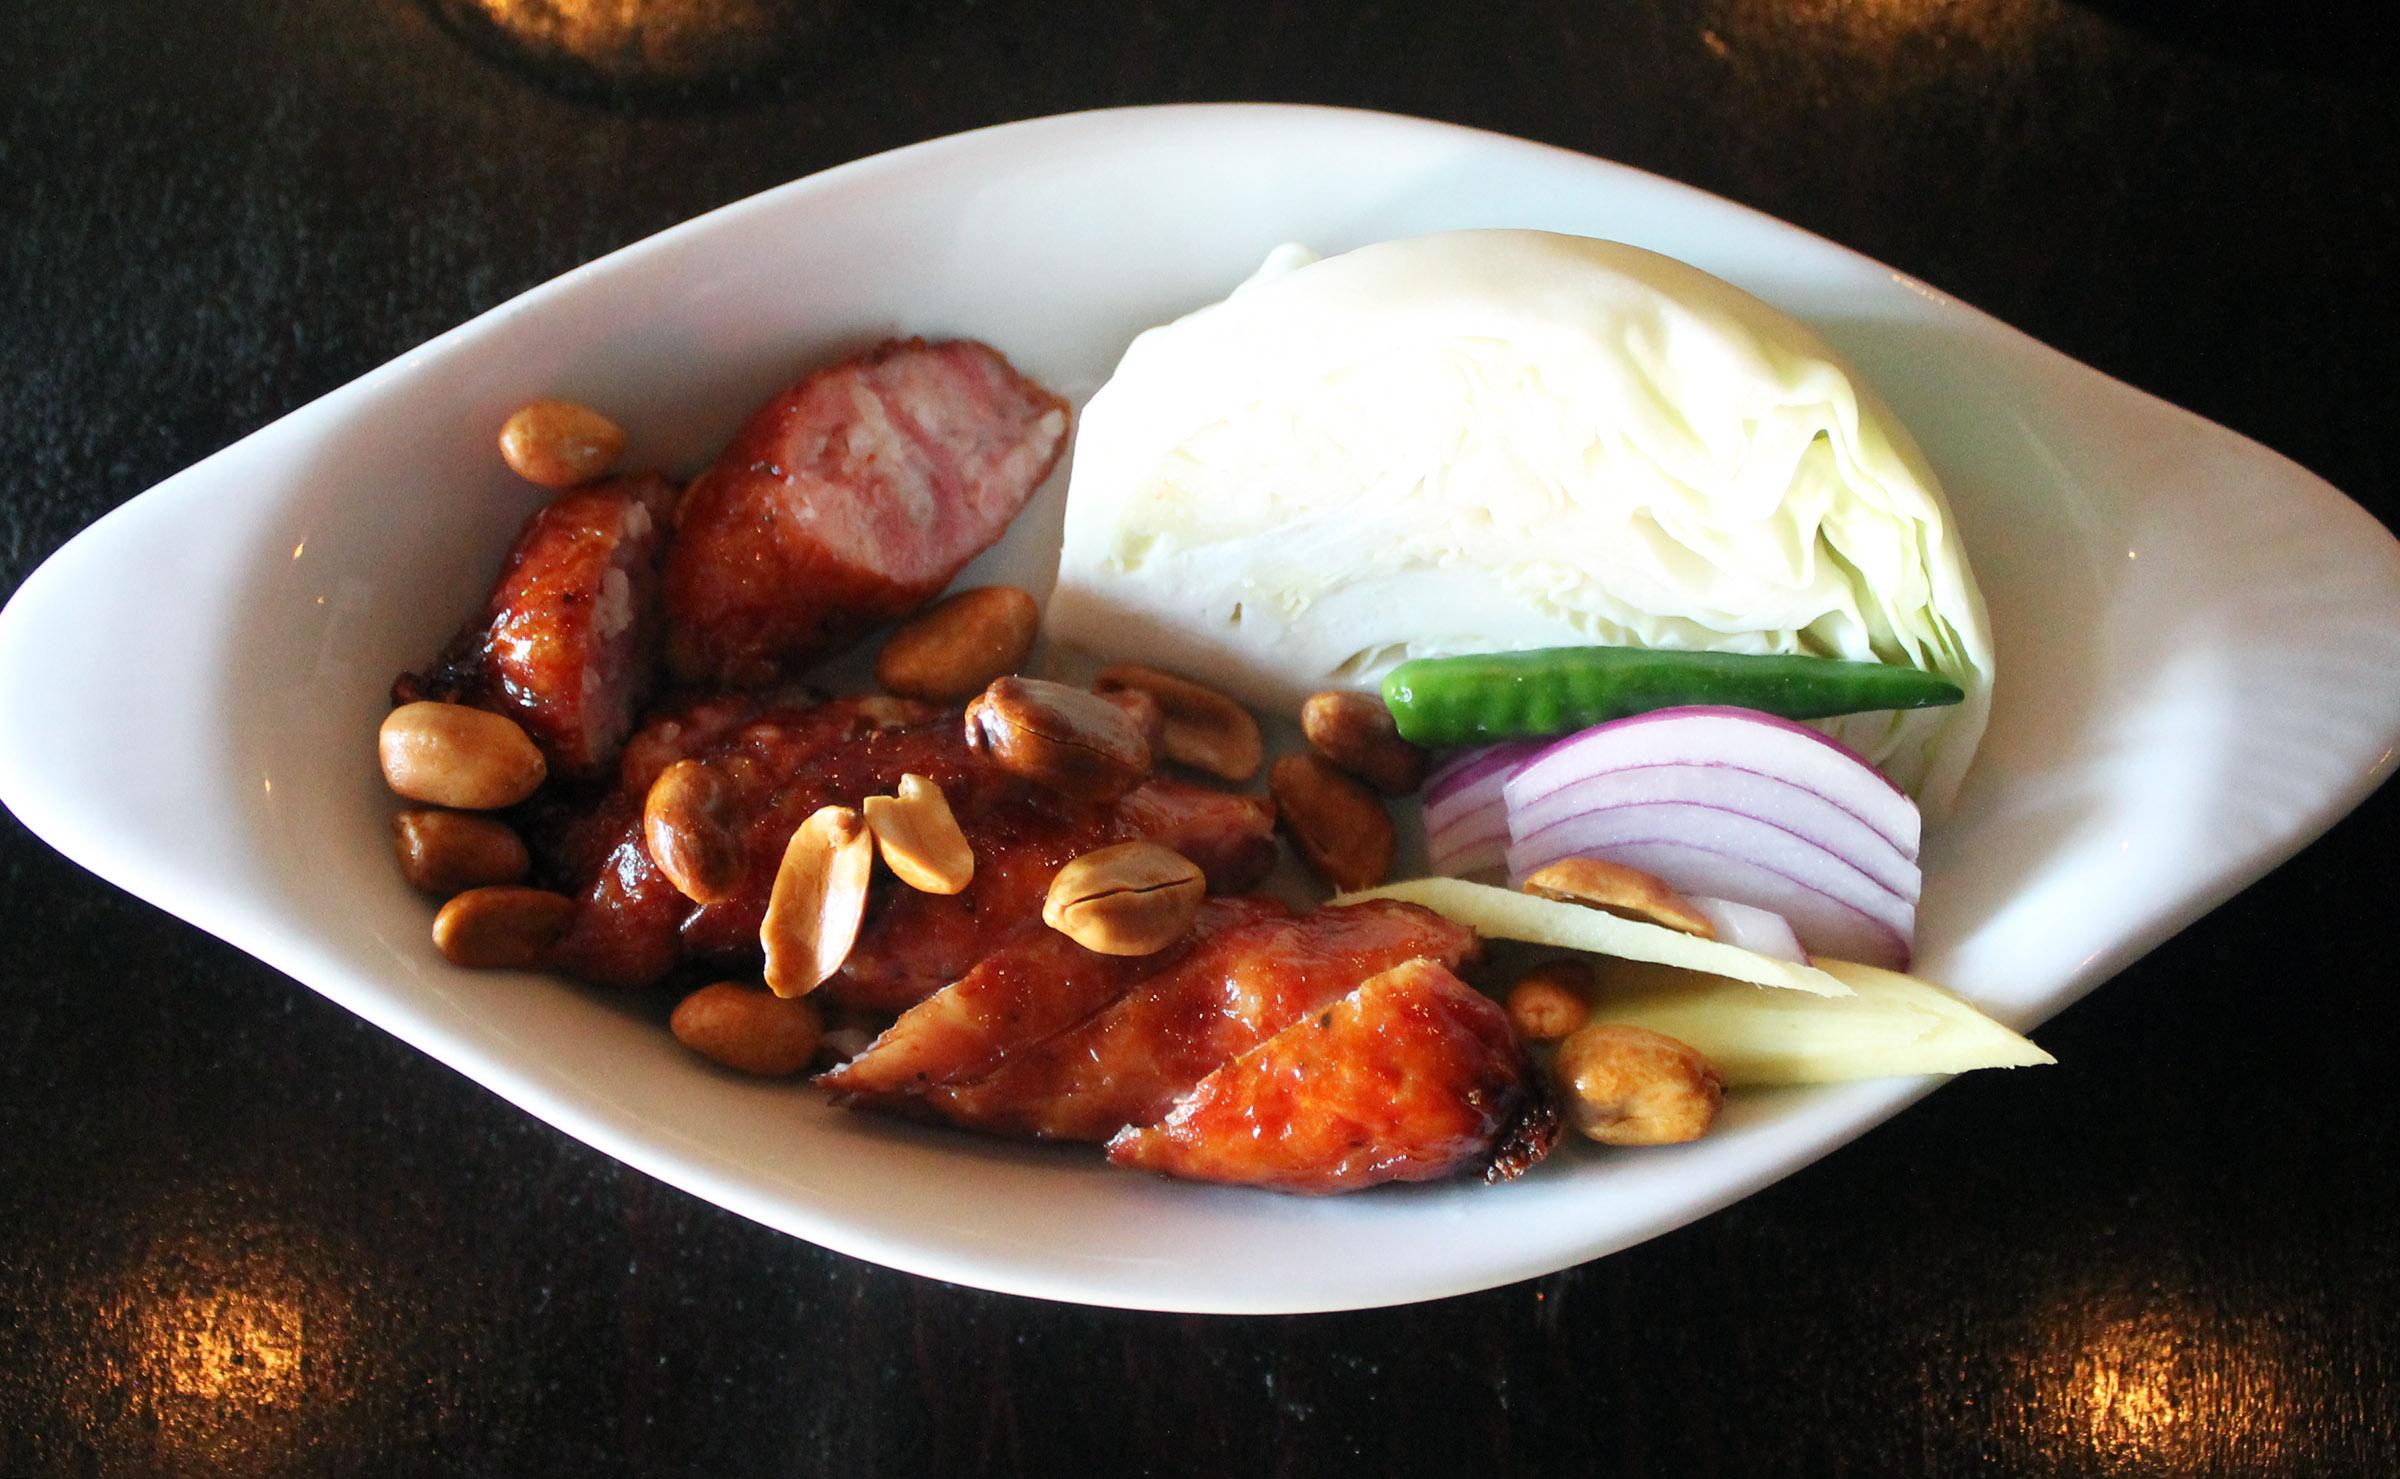 Sai Kork Esan - Thai Sausage:pork sausage with cabbage, chili, peanut and ginger